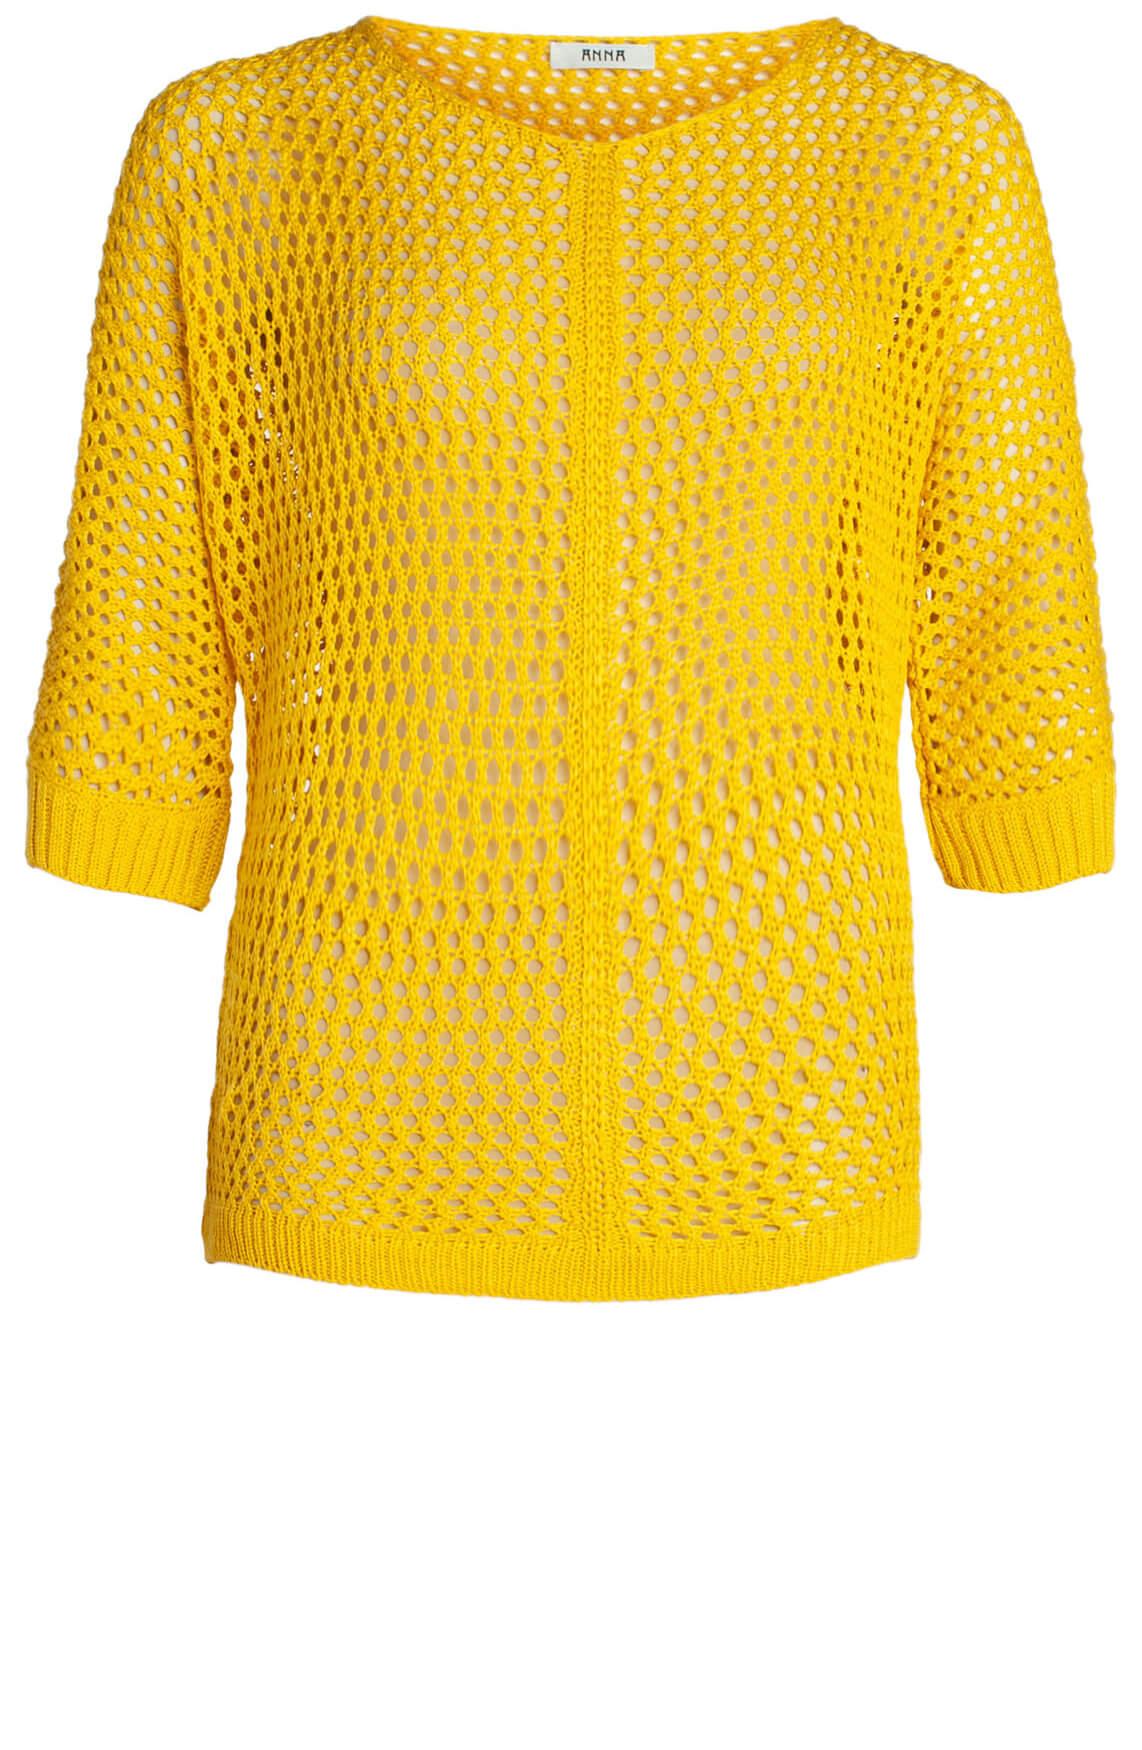 Anna Dames Gehaakte pullover geel